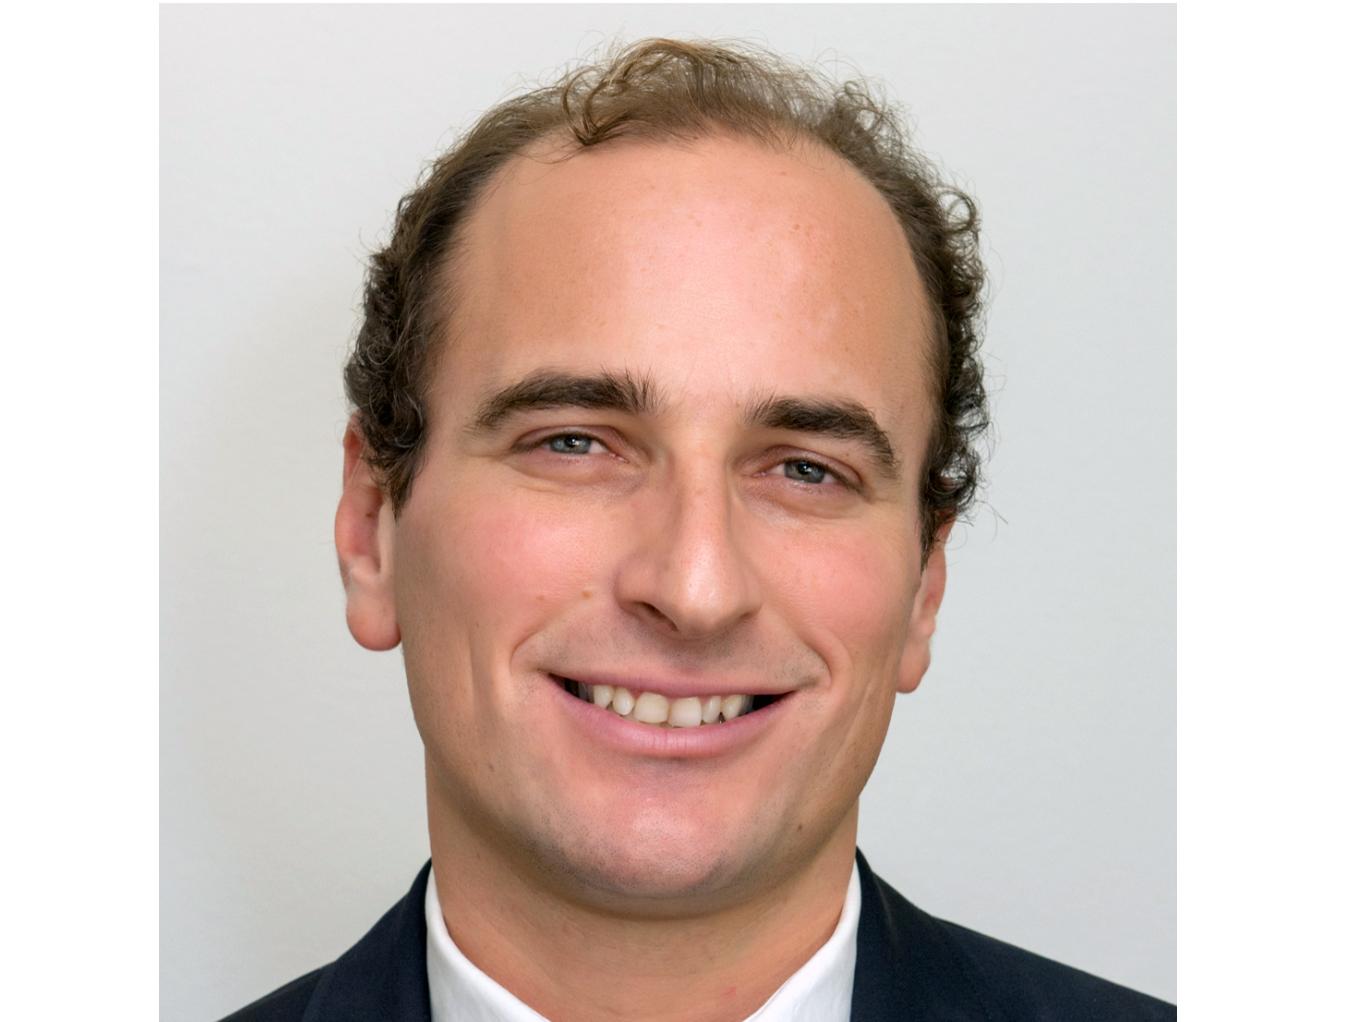 Sergio Puig